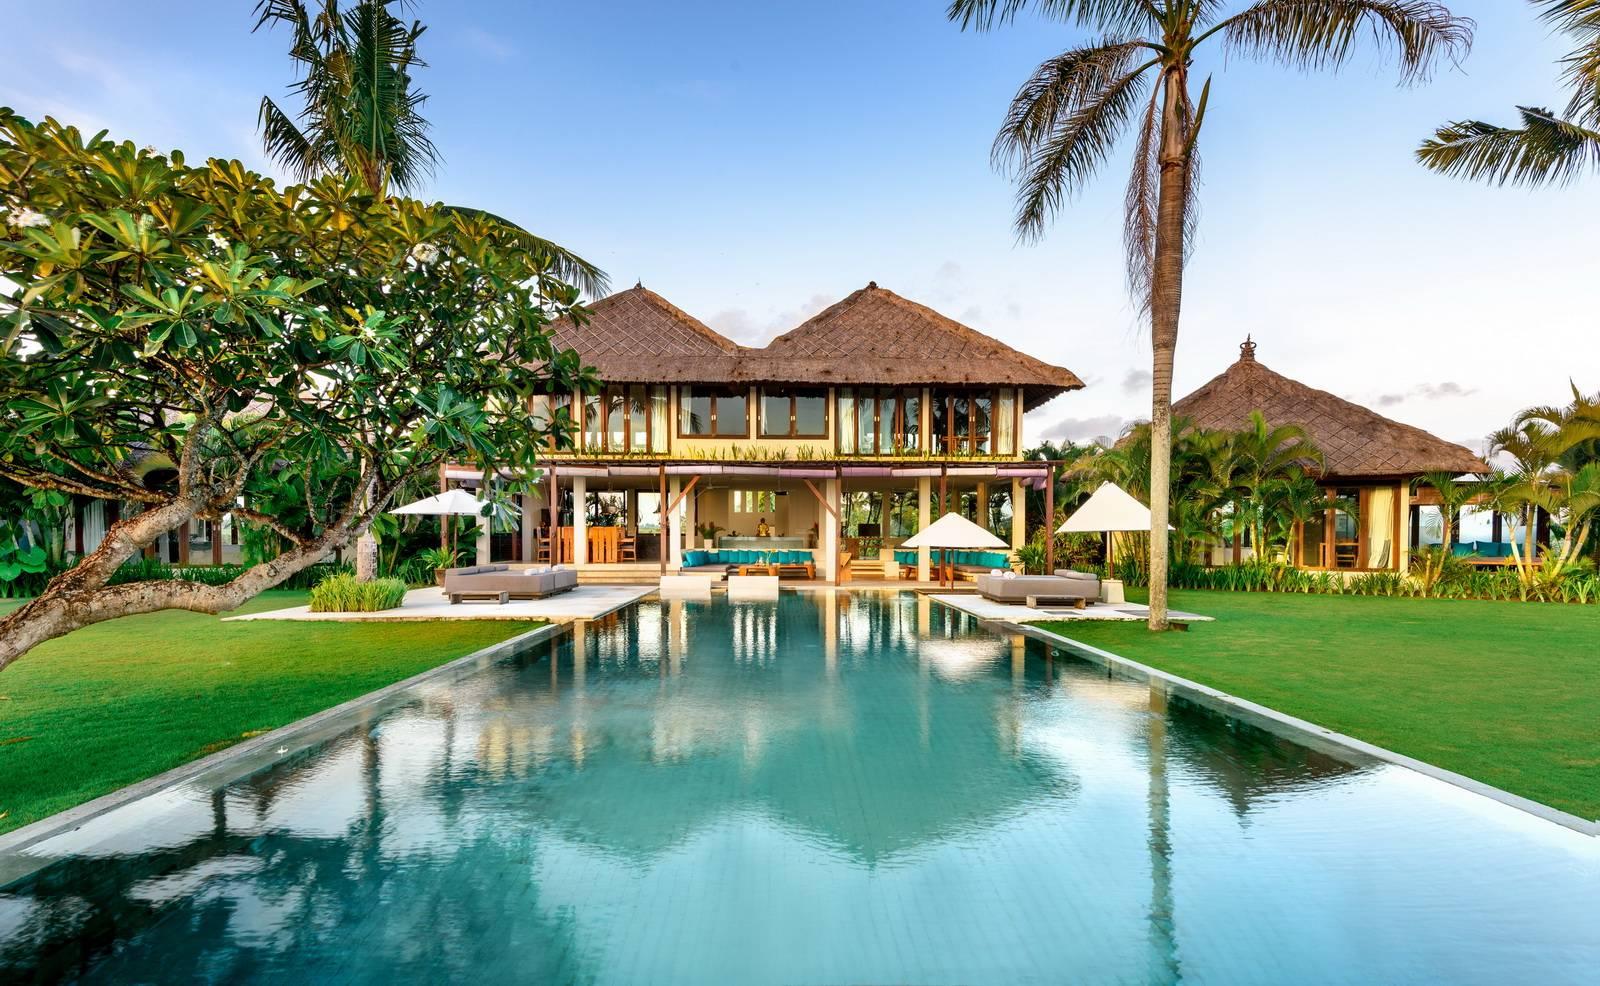 12 Bedroom Luxury Beachfront Pool Villa Canggu Bali